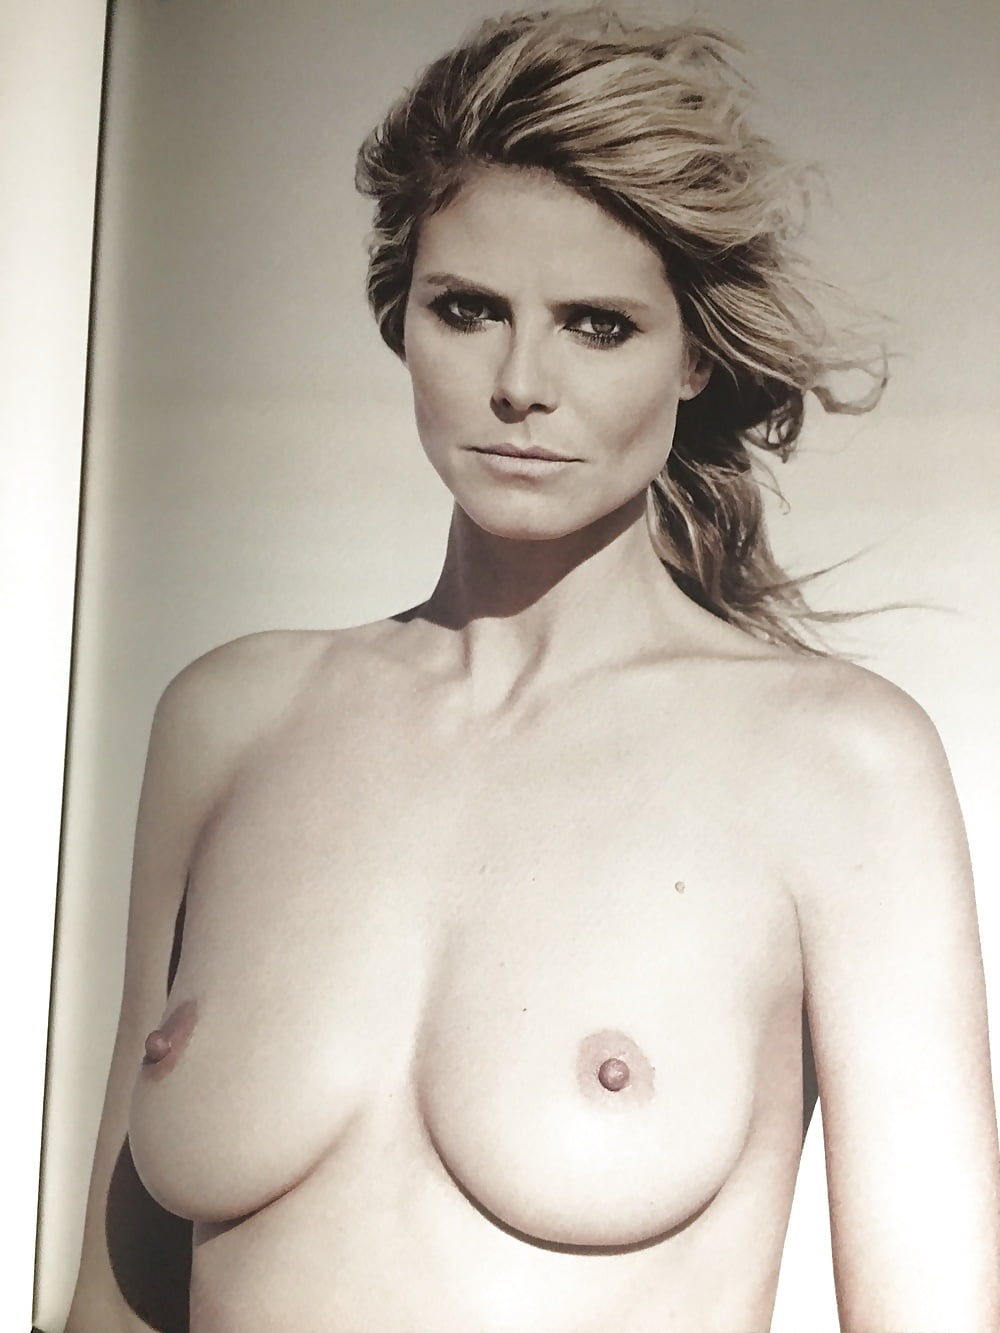 Hq imagen de heidi klum desnuda